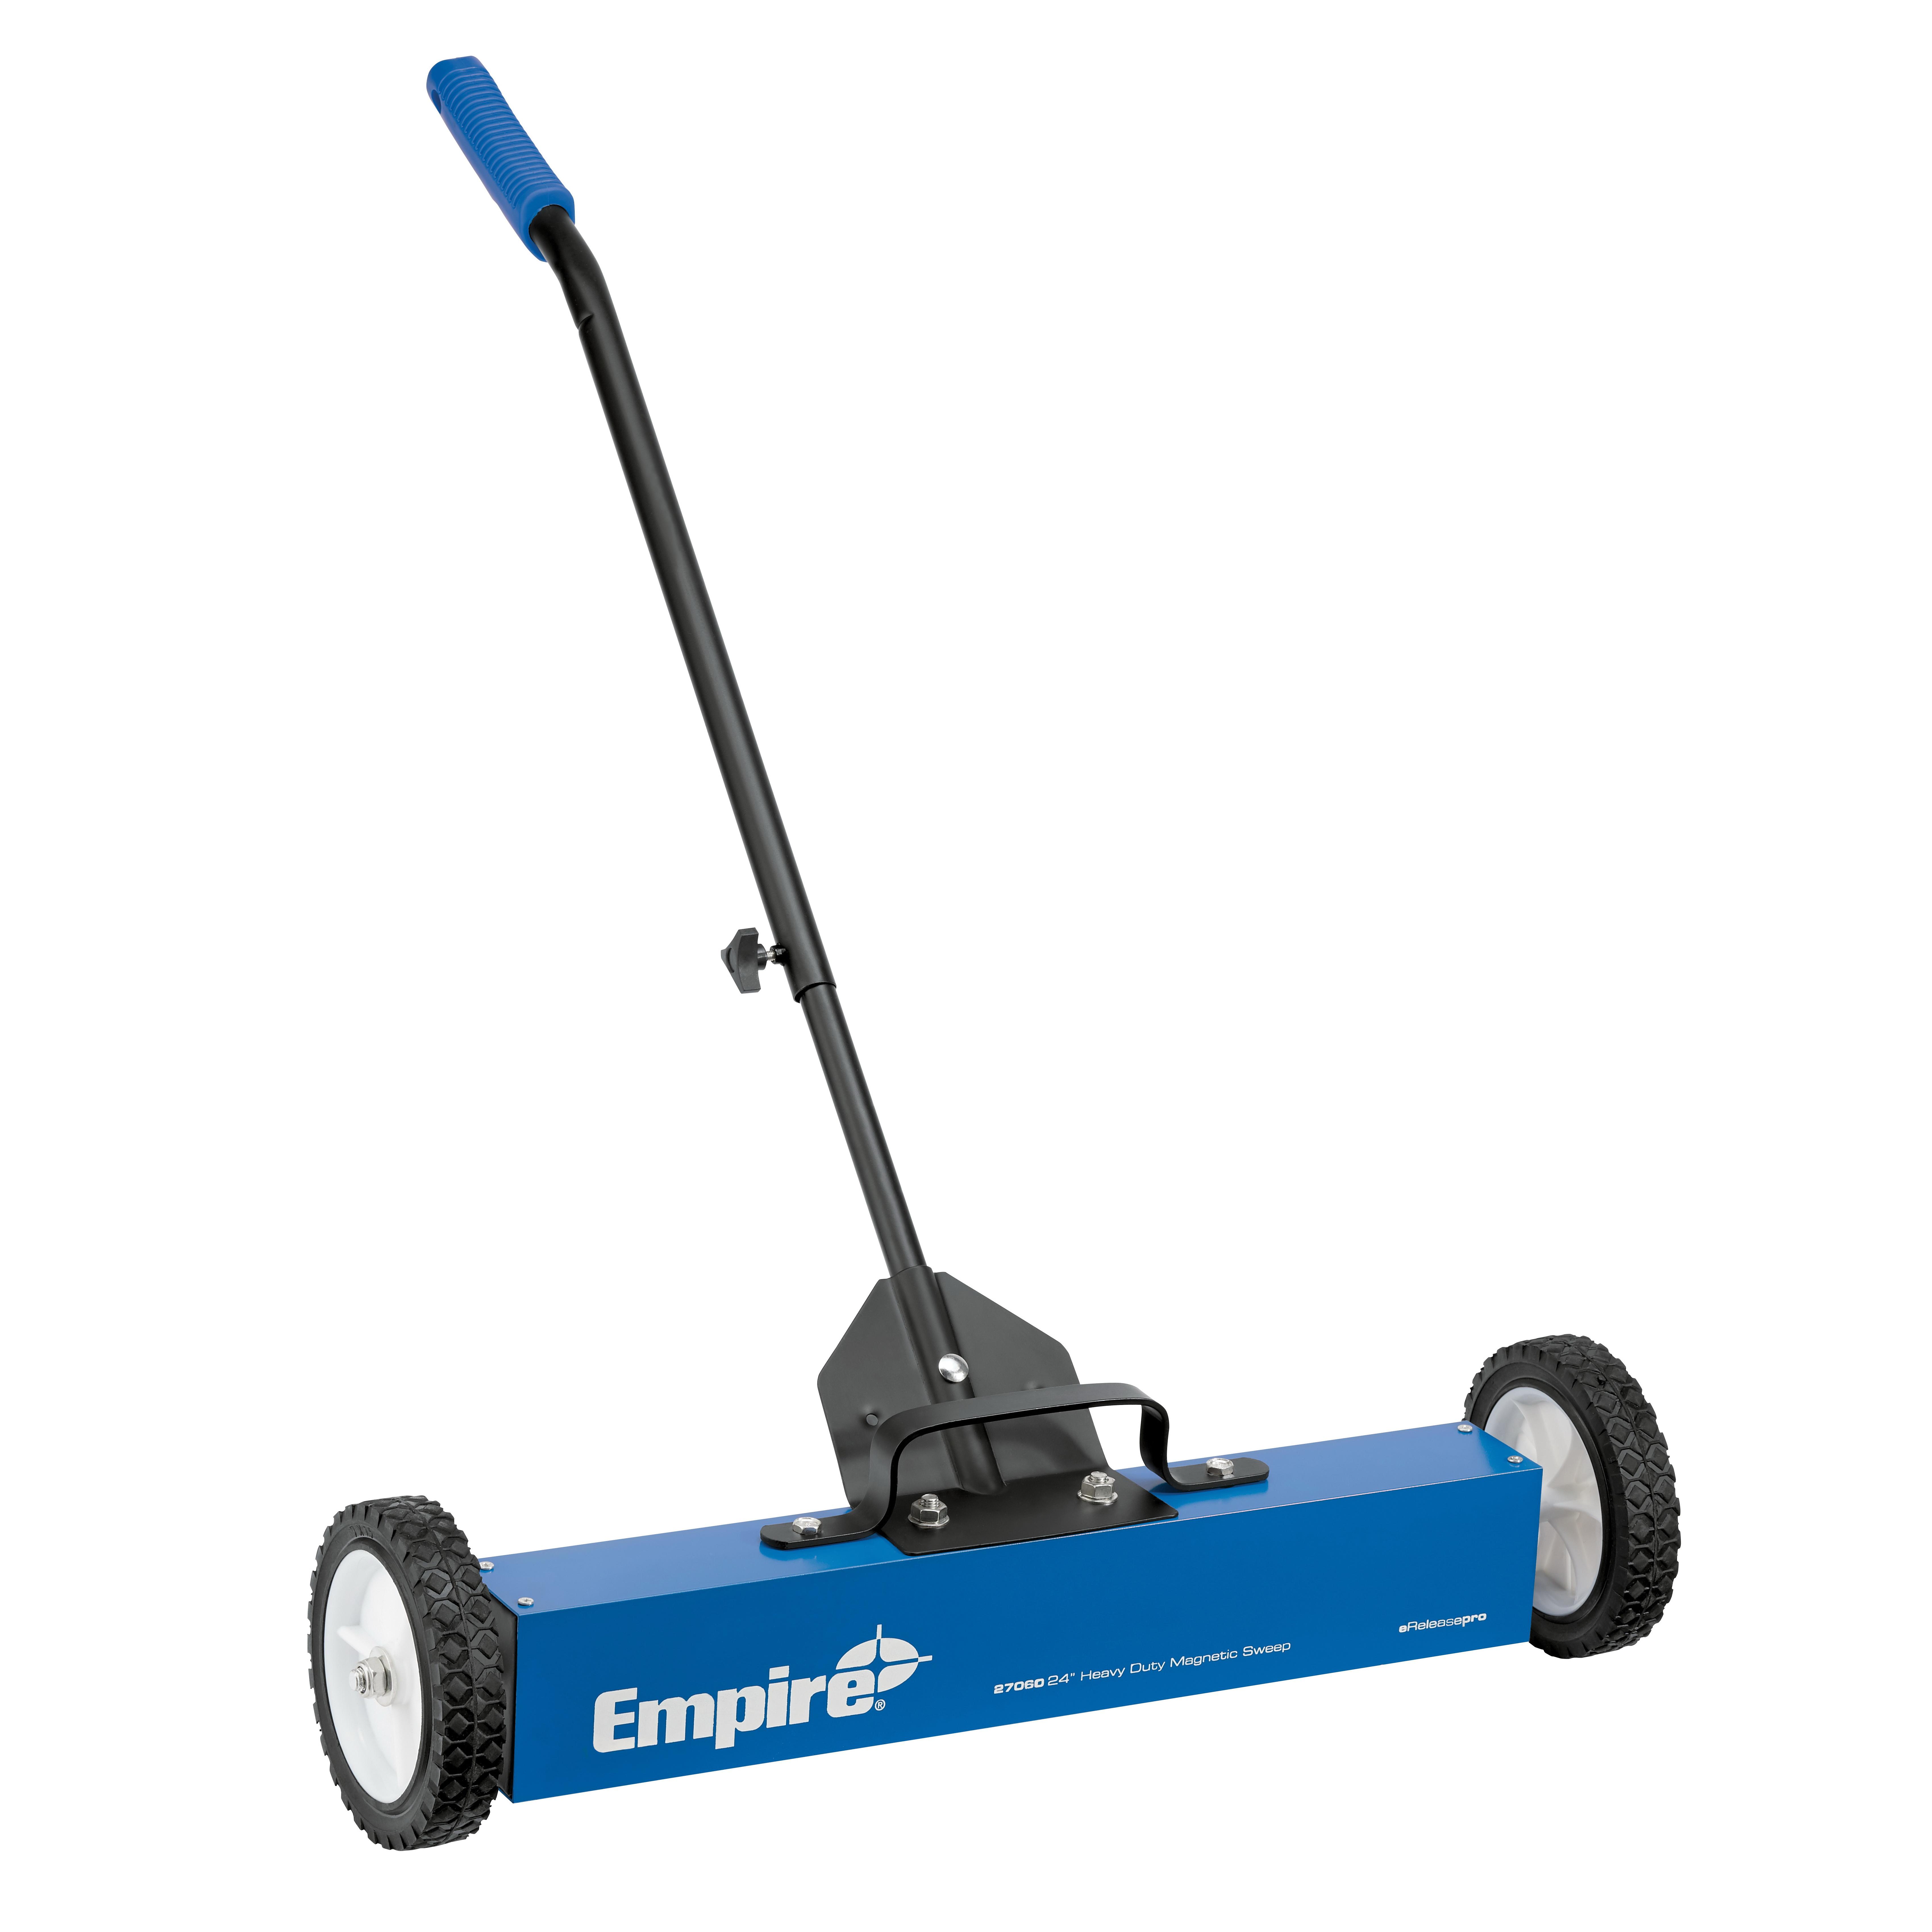 Empire® 27060 Heavy Duty Magnetic Clean Sweep, 30 lb, Heavy Gauge Aluminum Housing